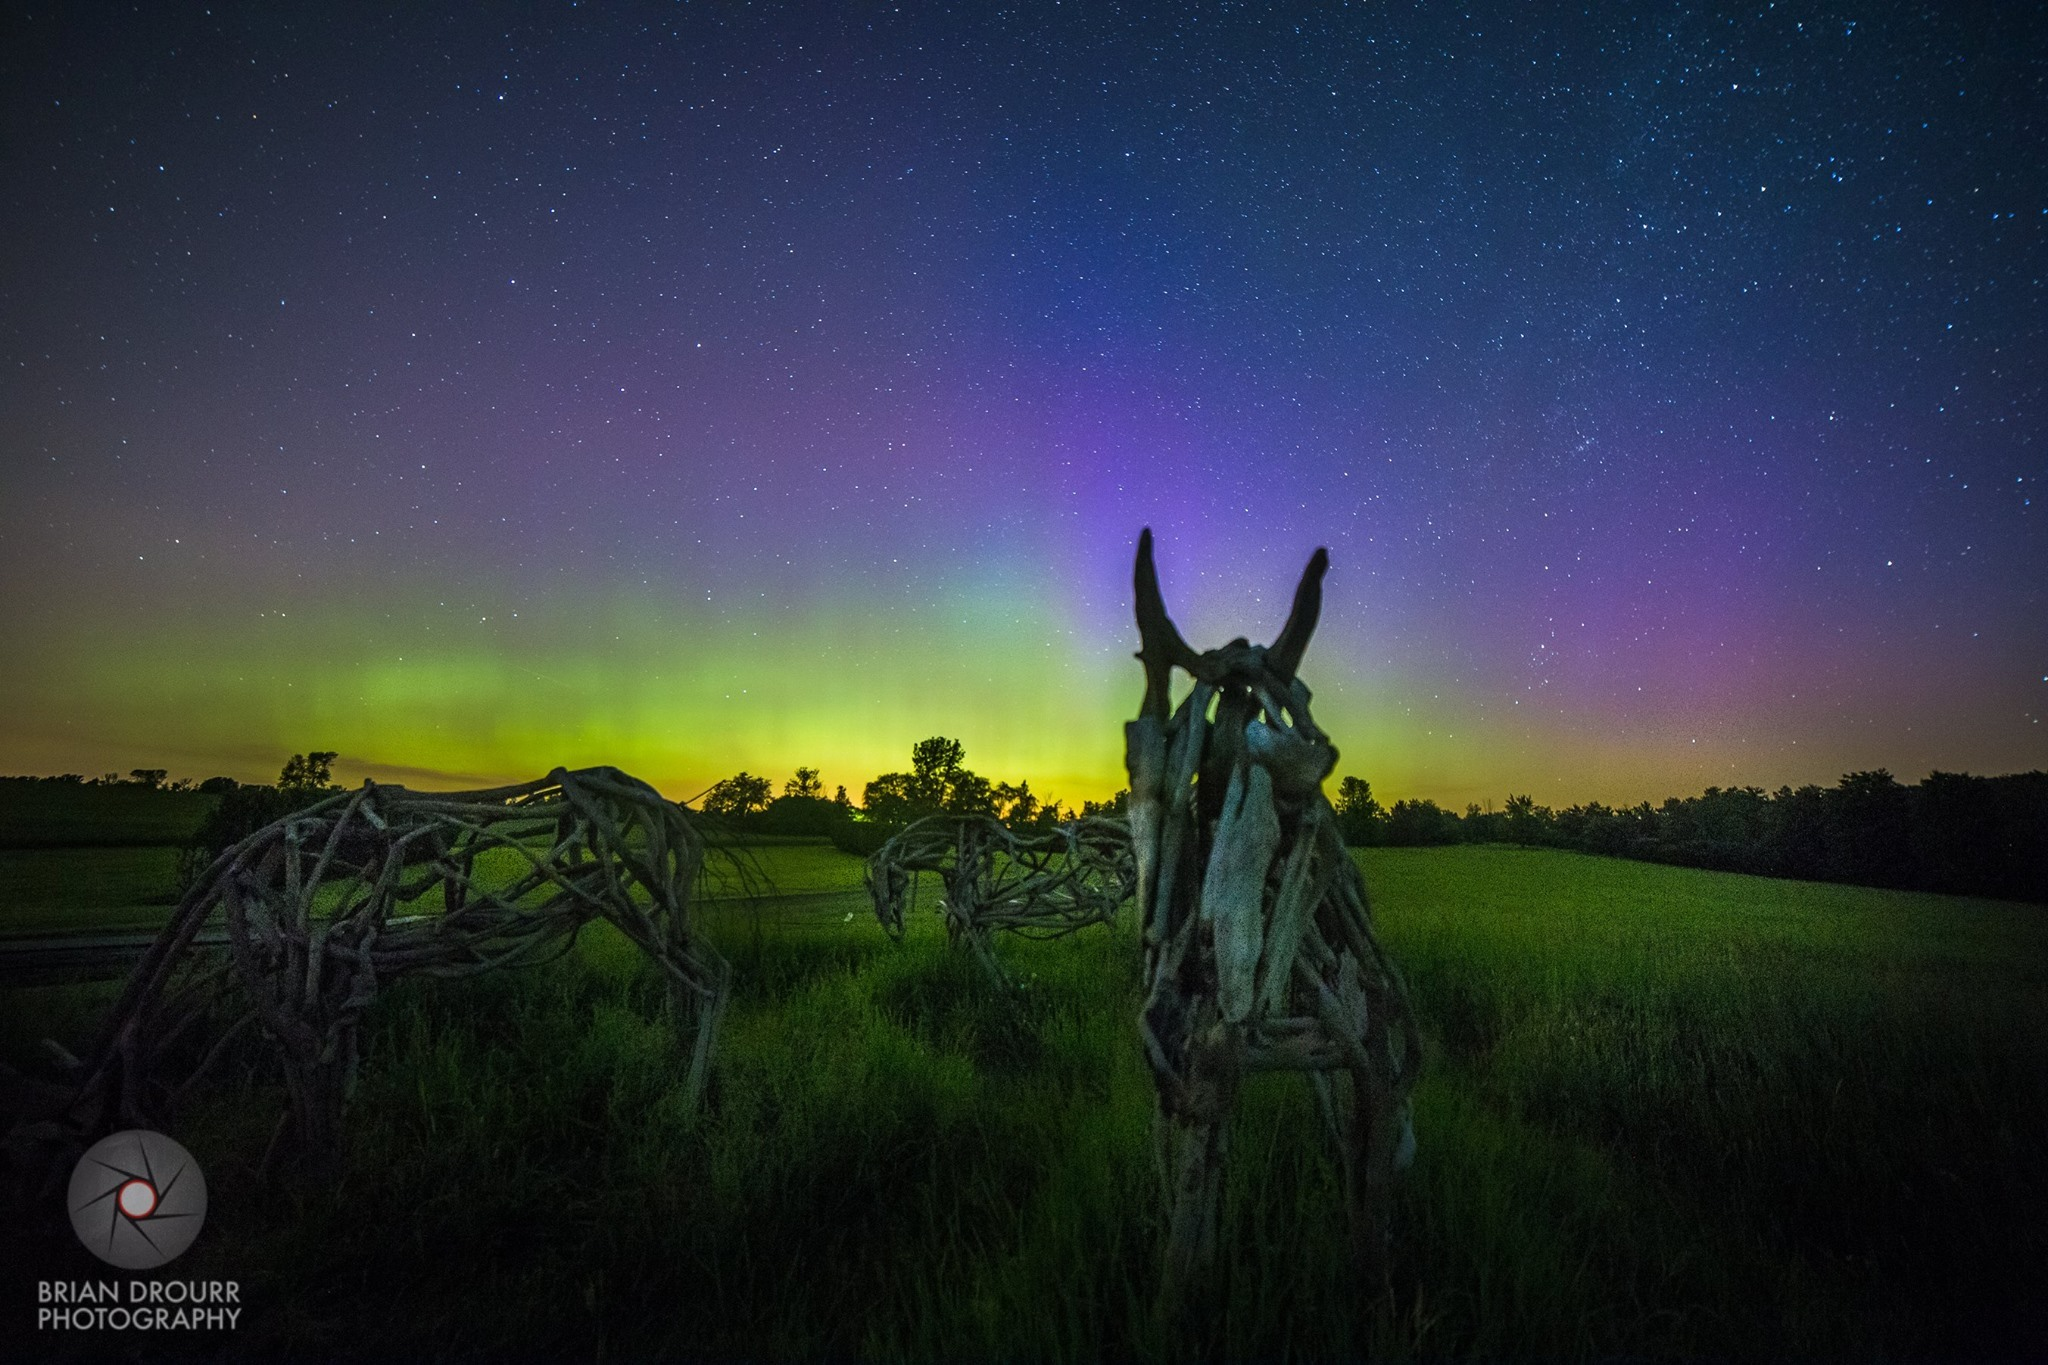 Springtime Auroras Dance in Vermont Night Sky (Photo)